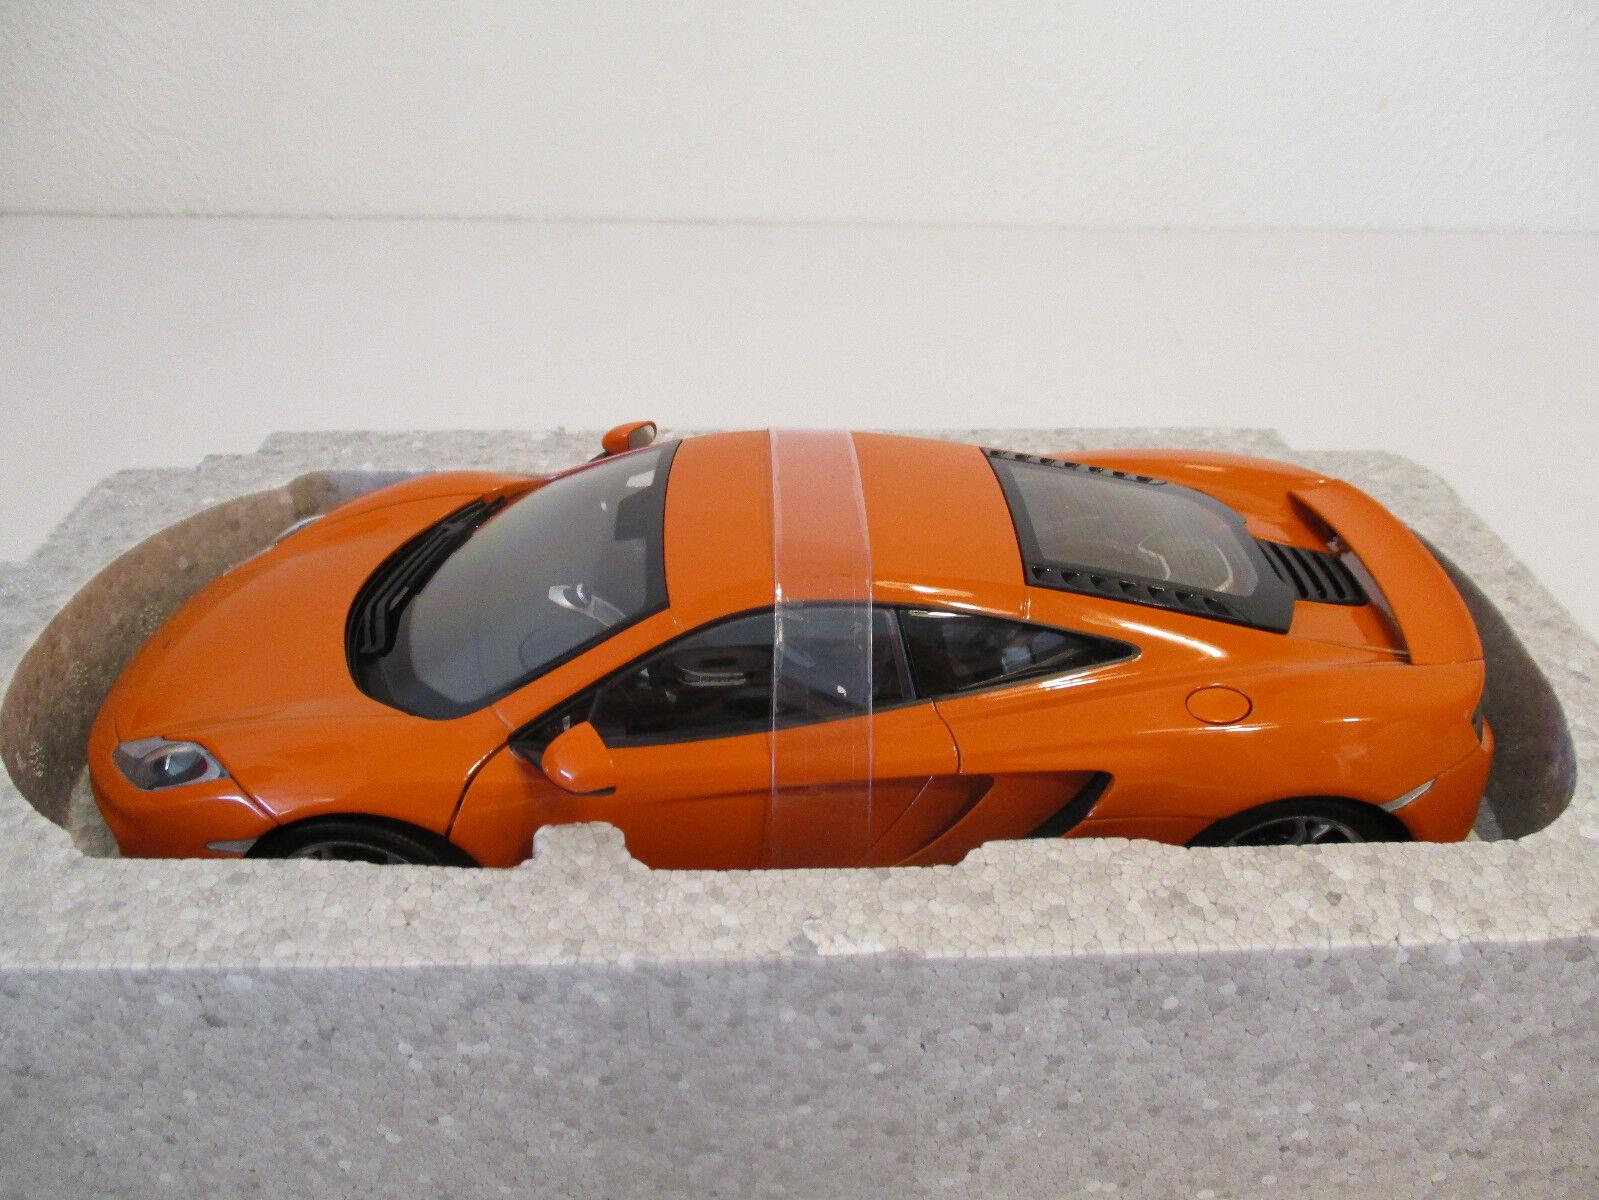 (Gok) (Gok) (Gok) 1 18 Autoart mclaren 12 C Orange   614 nuevo embalaje original 85dffe